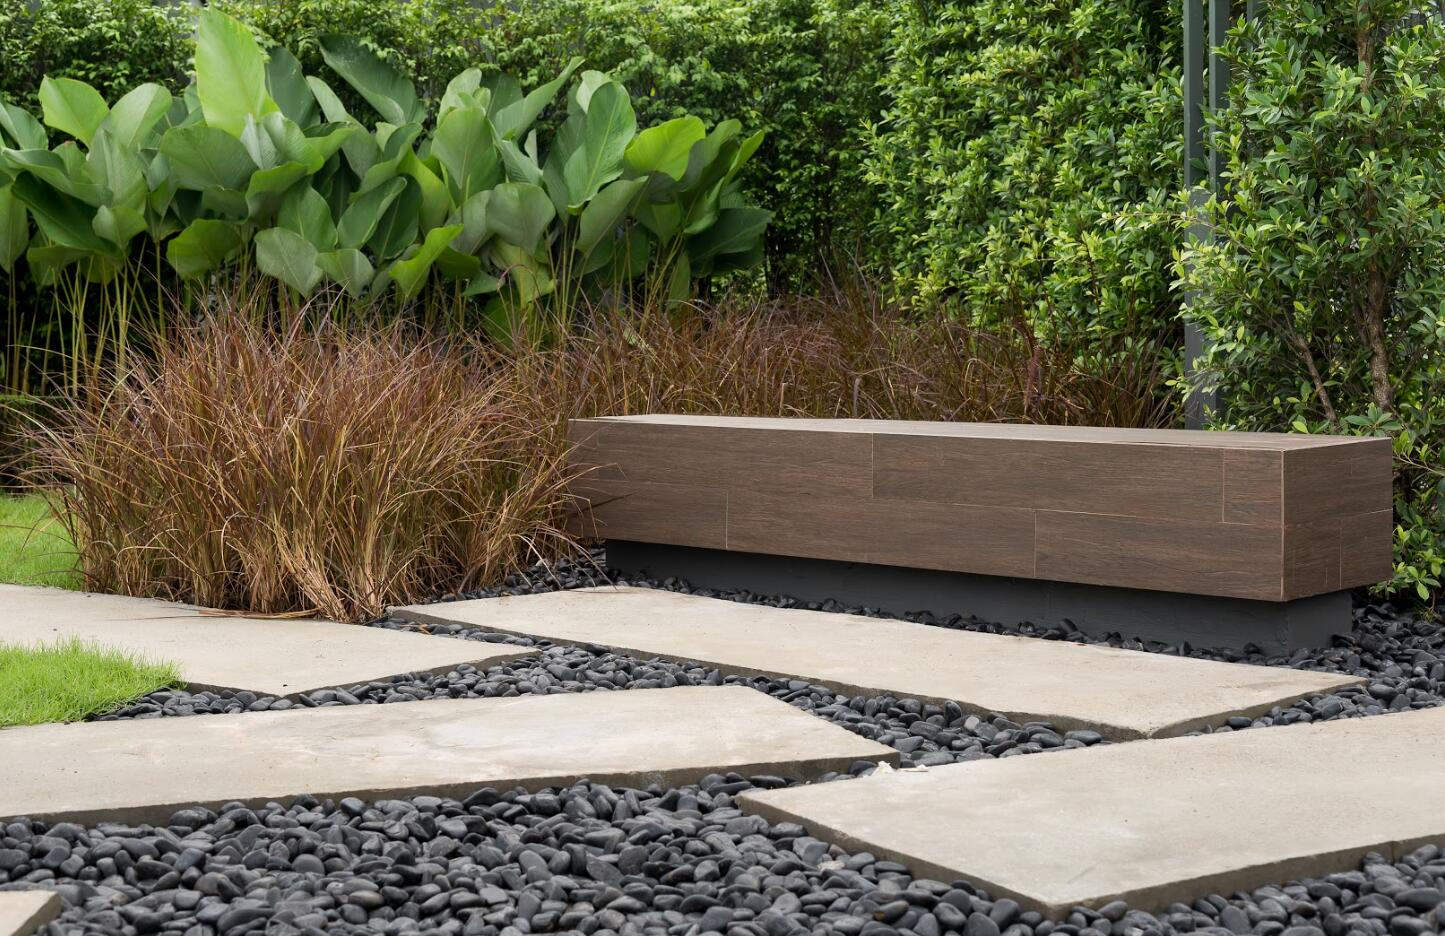 Transform Your Garden Into A Gorgeous Living Space 9 Ways To Transform Your Garden Into A Gorgeous Living Space